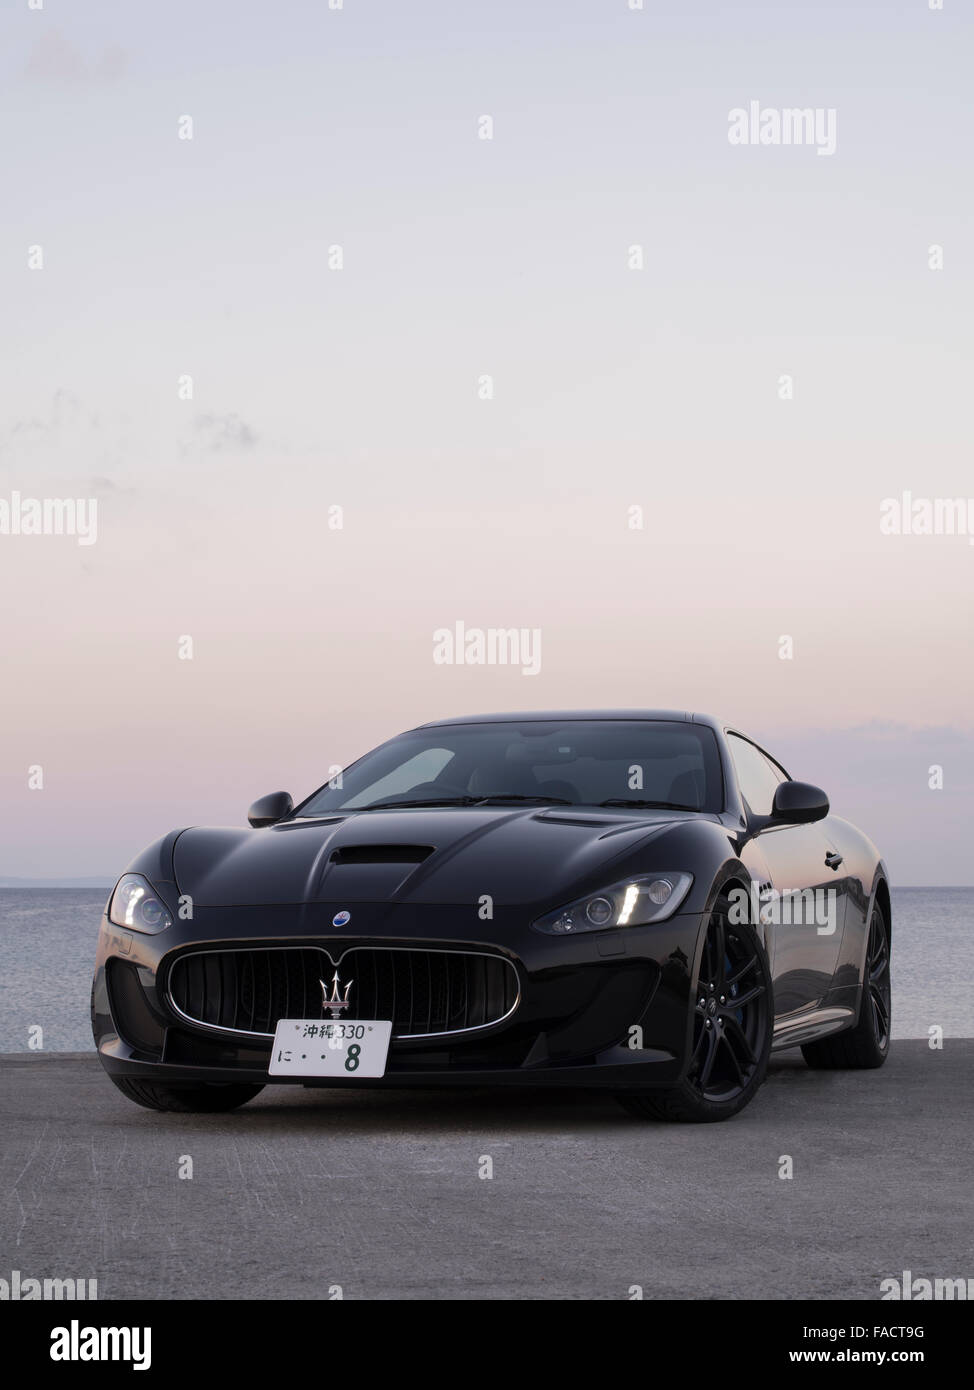 Maserati GranTurismo MC Stradale (2015 model) Italian Sports car assembled Modena, Italy. Pininfarina designed. - Stock Image